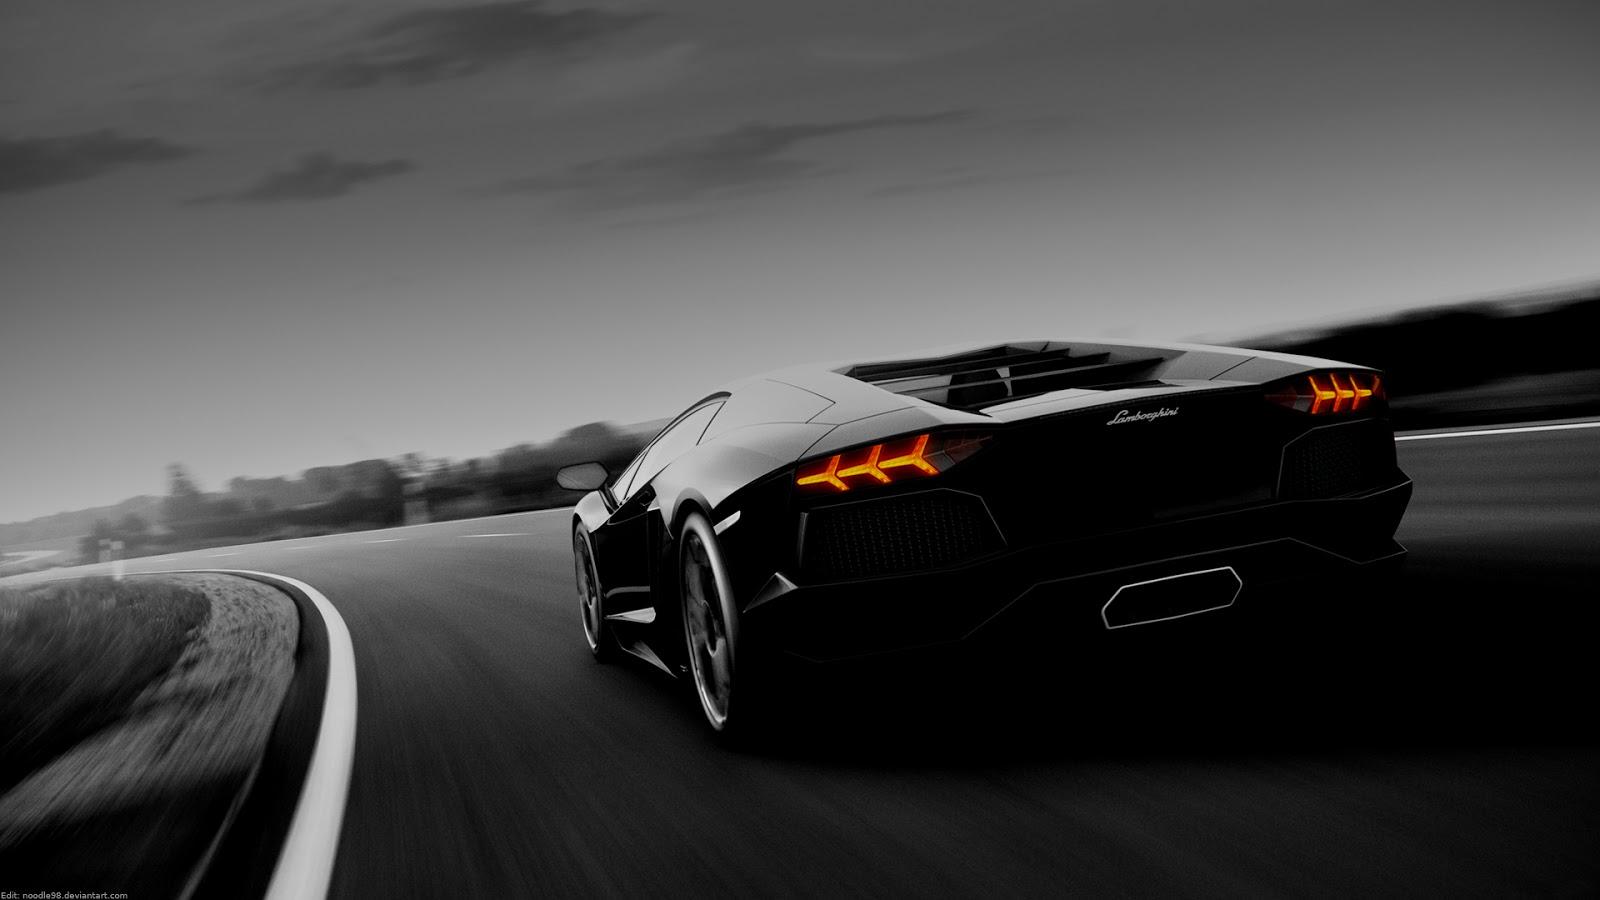 Lamborghini Aventador Free Wallpaper HD